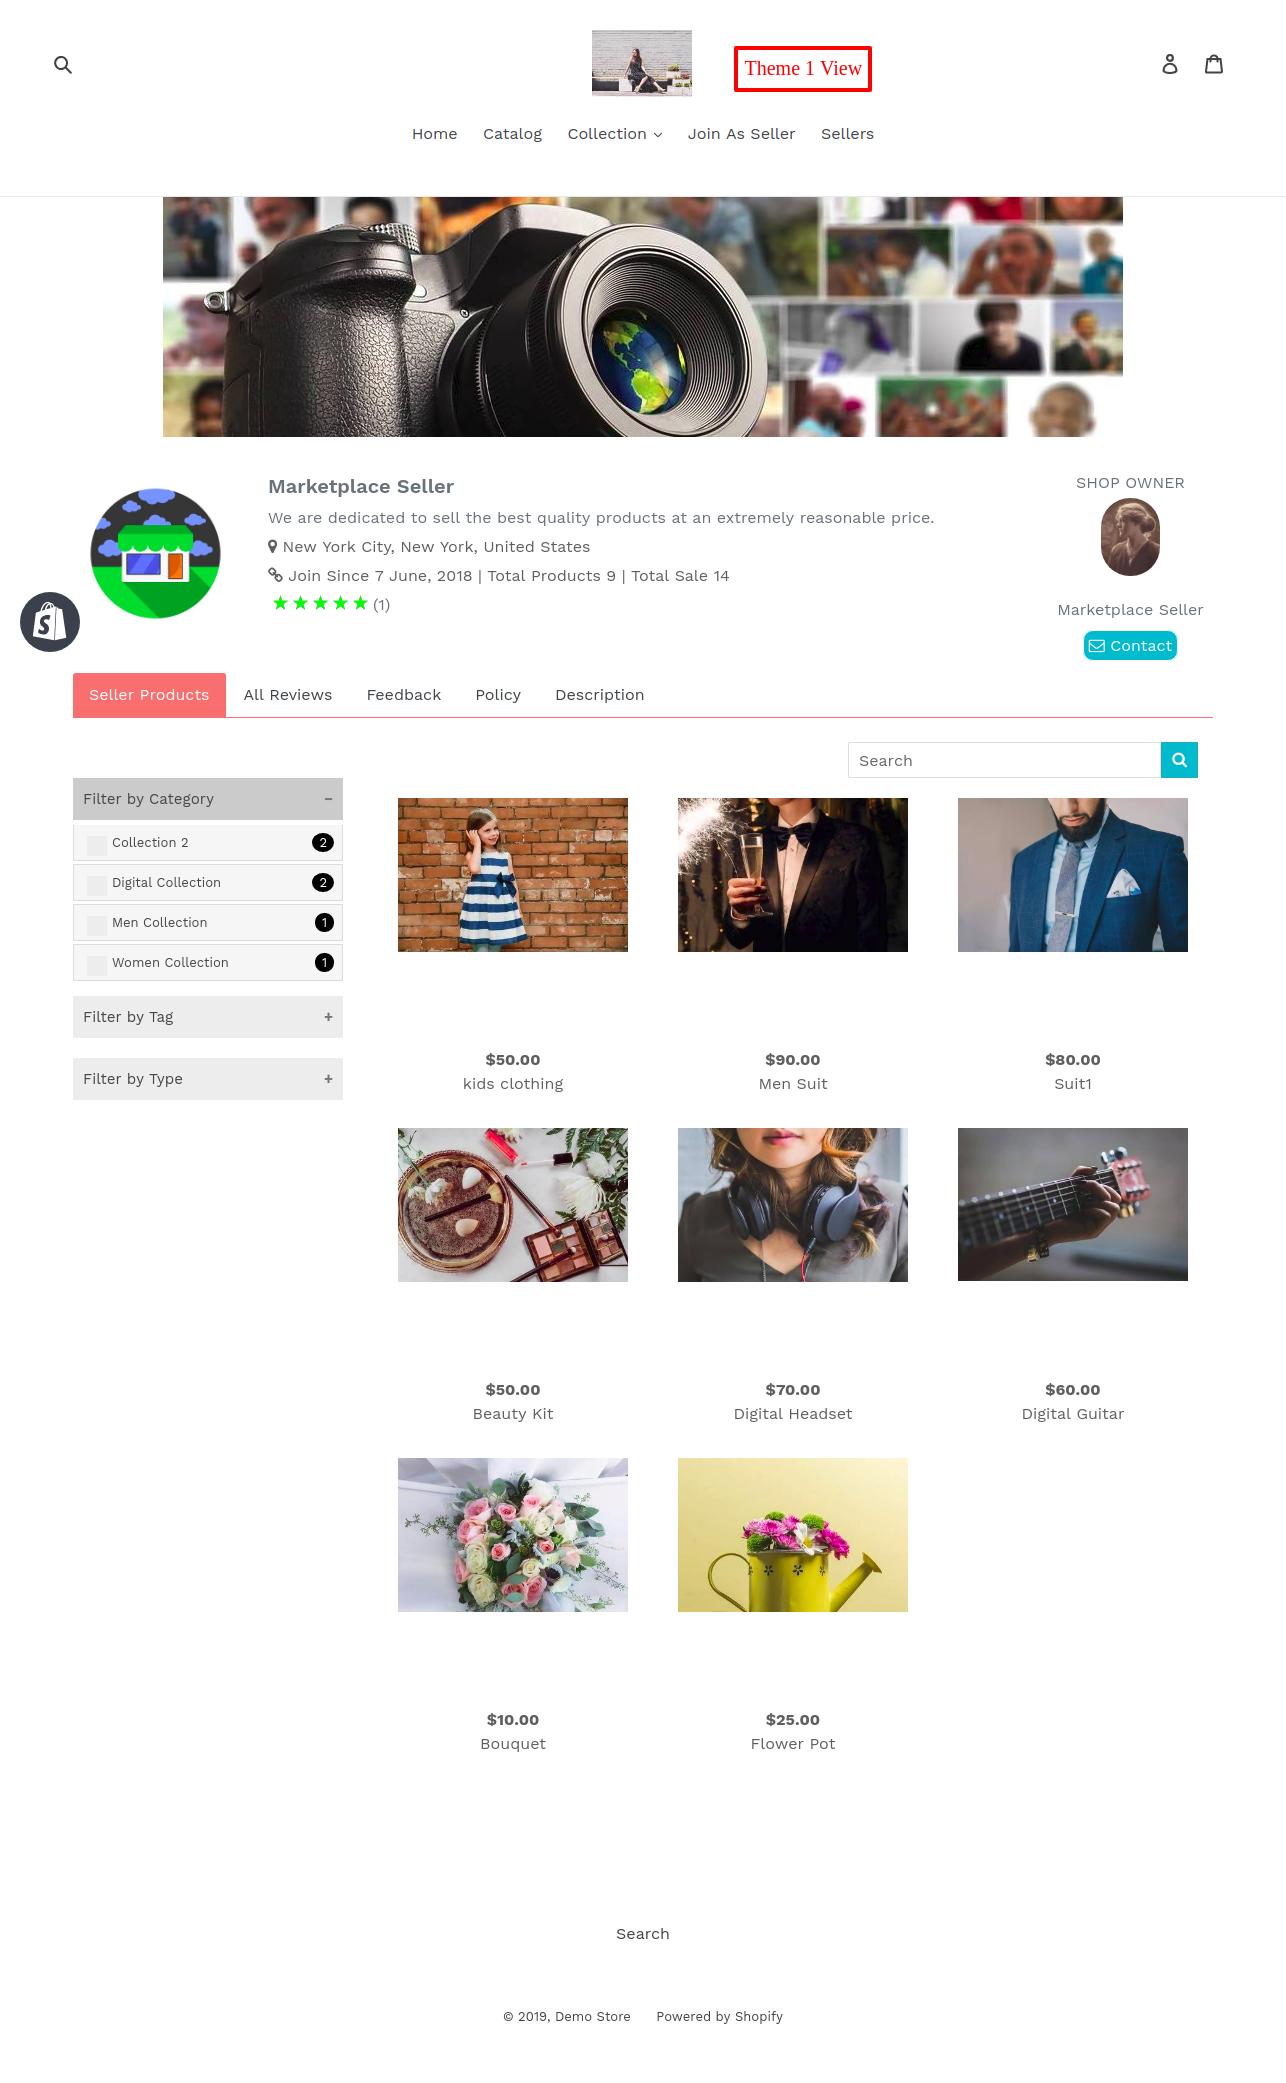 Seller Profile Theme1